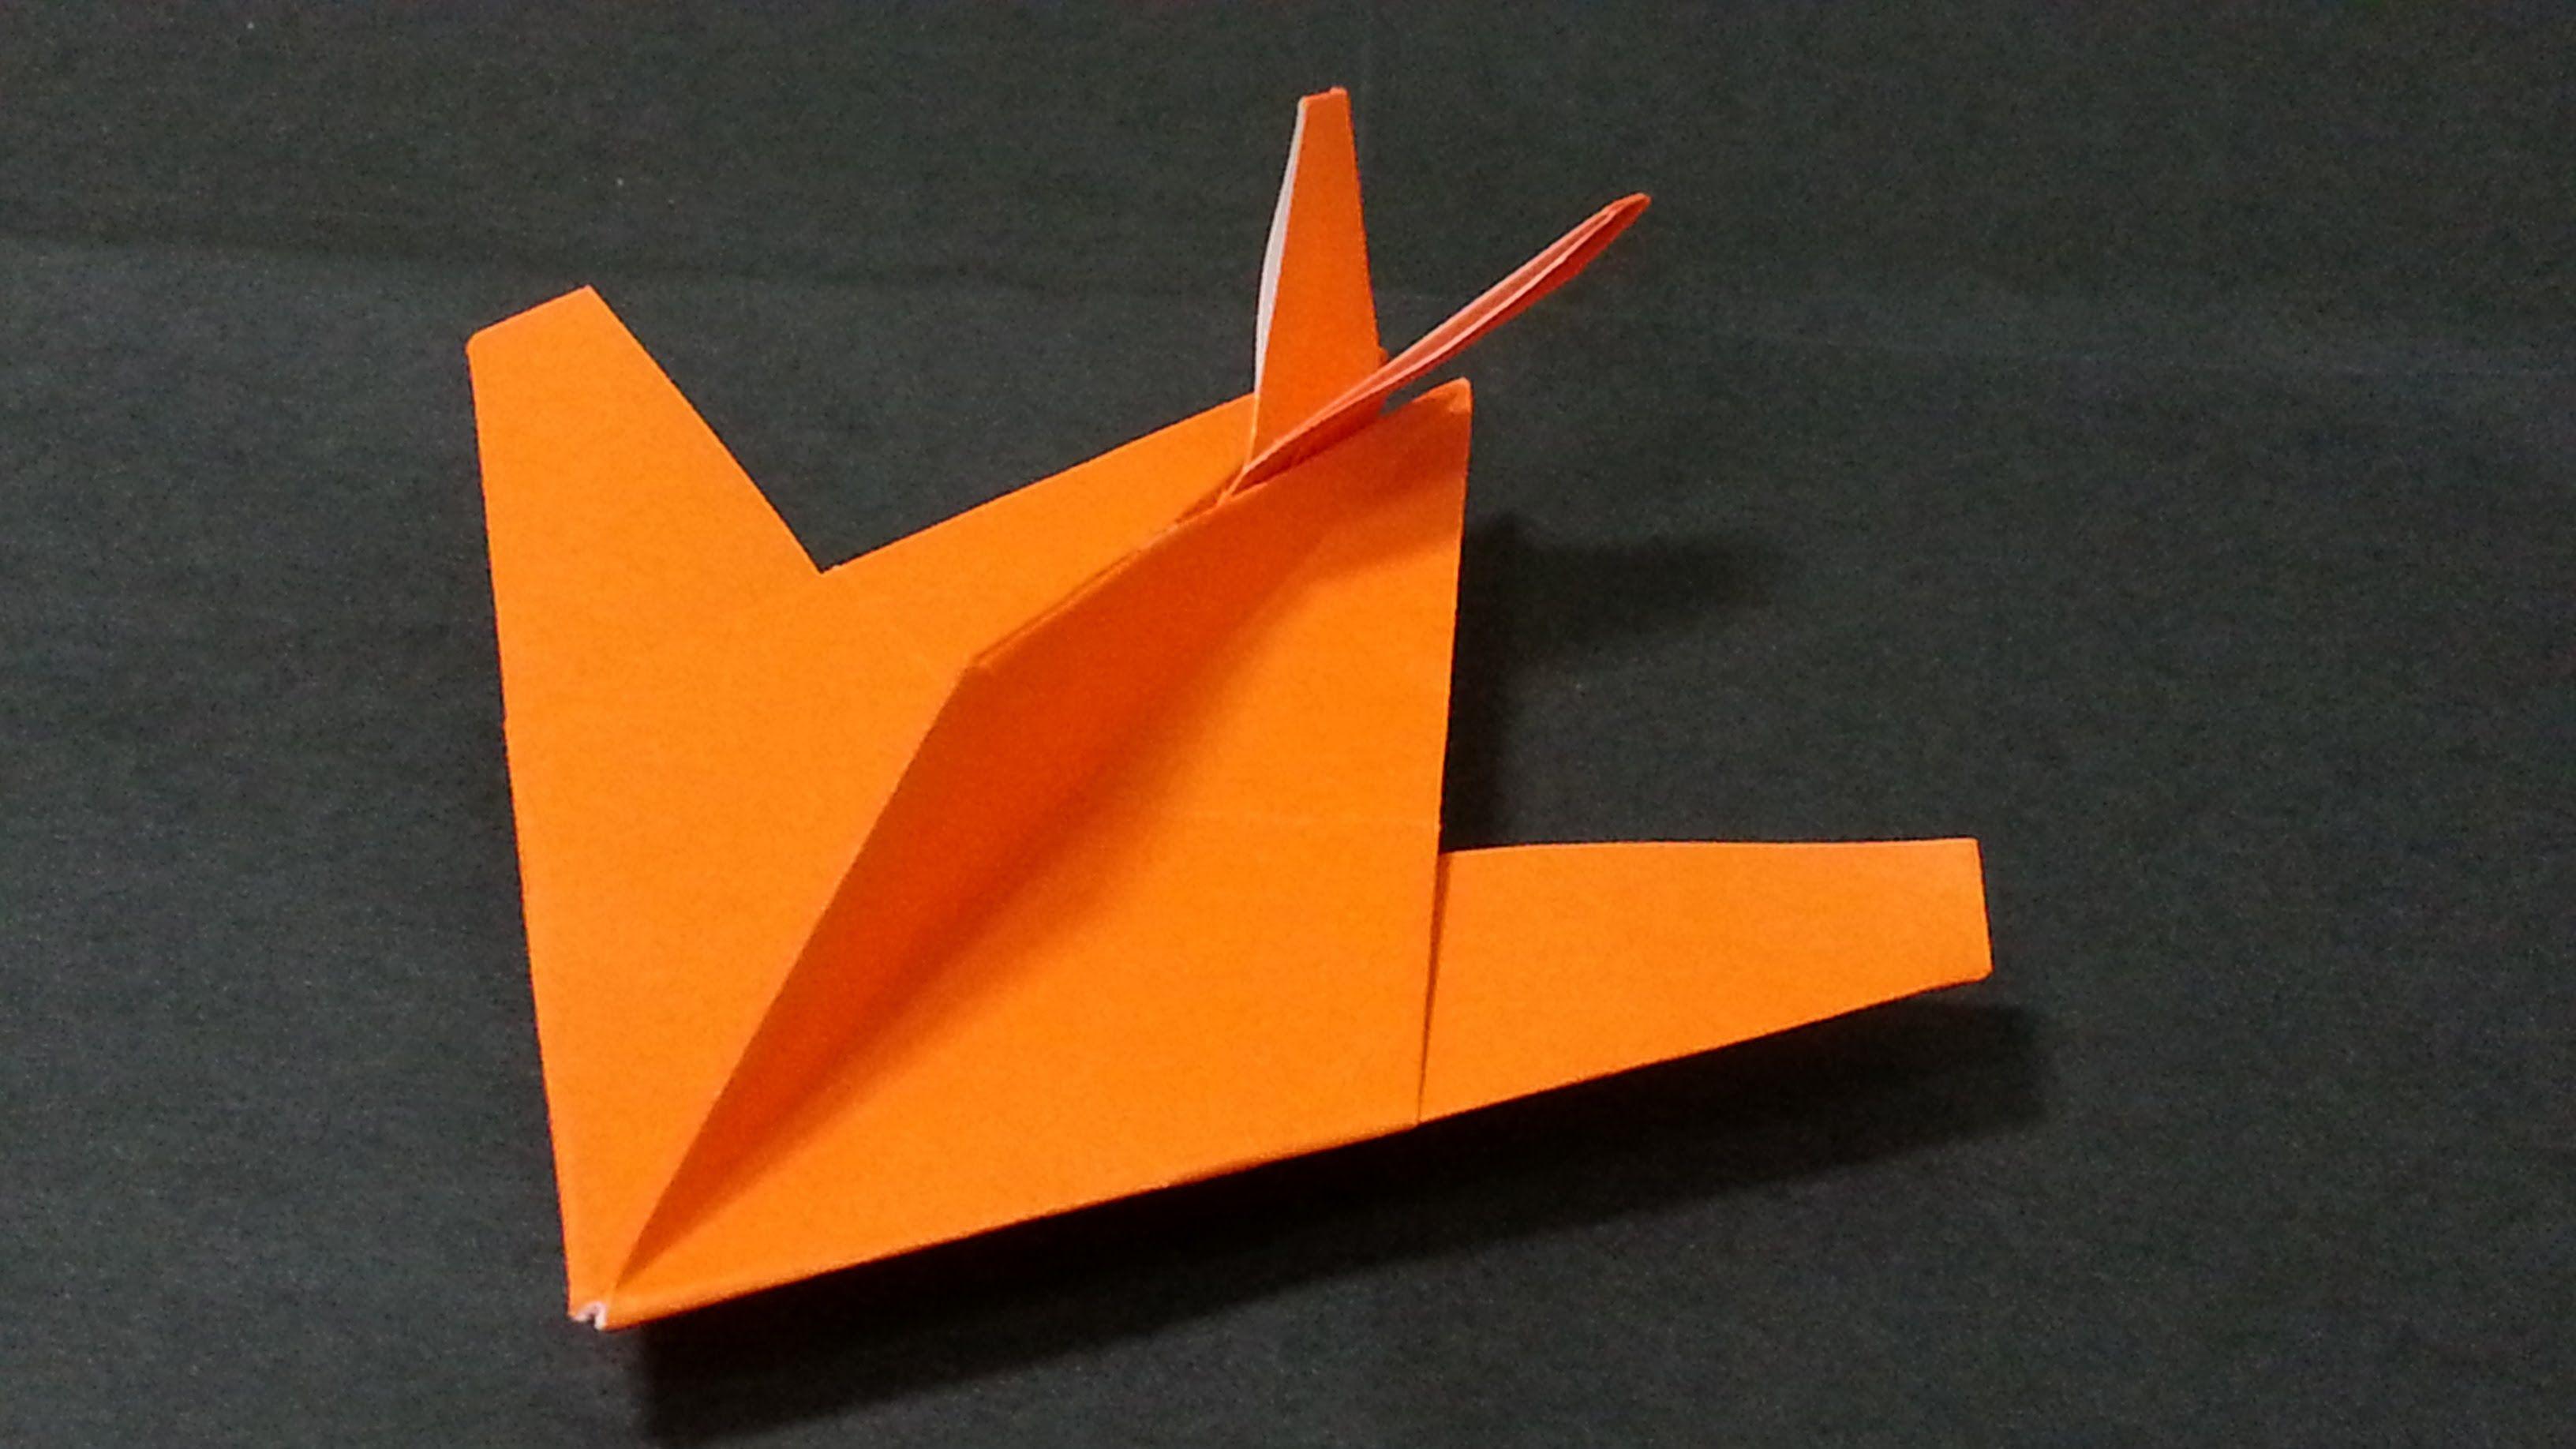 397 Origami 종이접기 (전투기 비행기)  F117 스텔스 전폭기  색종이접기  折纸 оригами 摺紙  折り紙  اور...